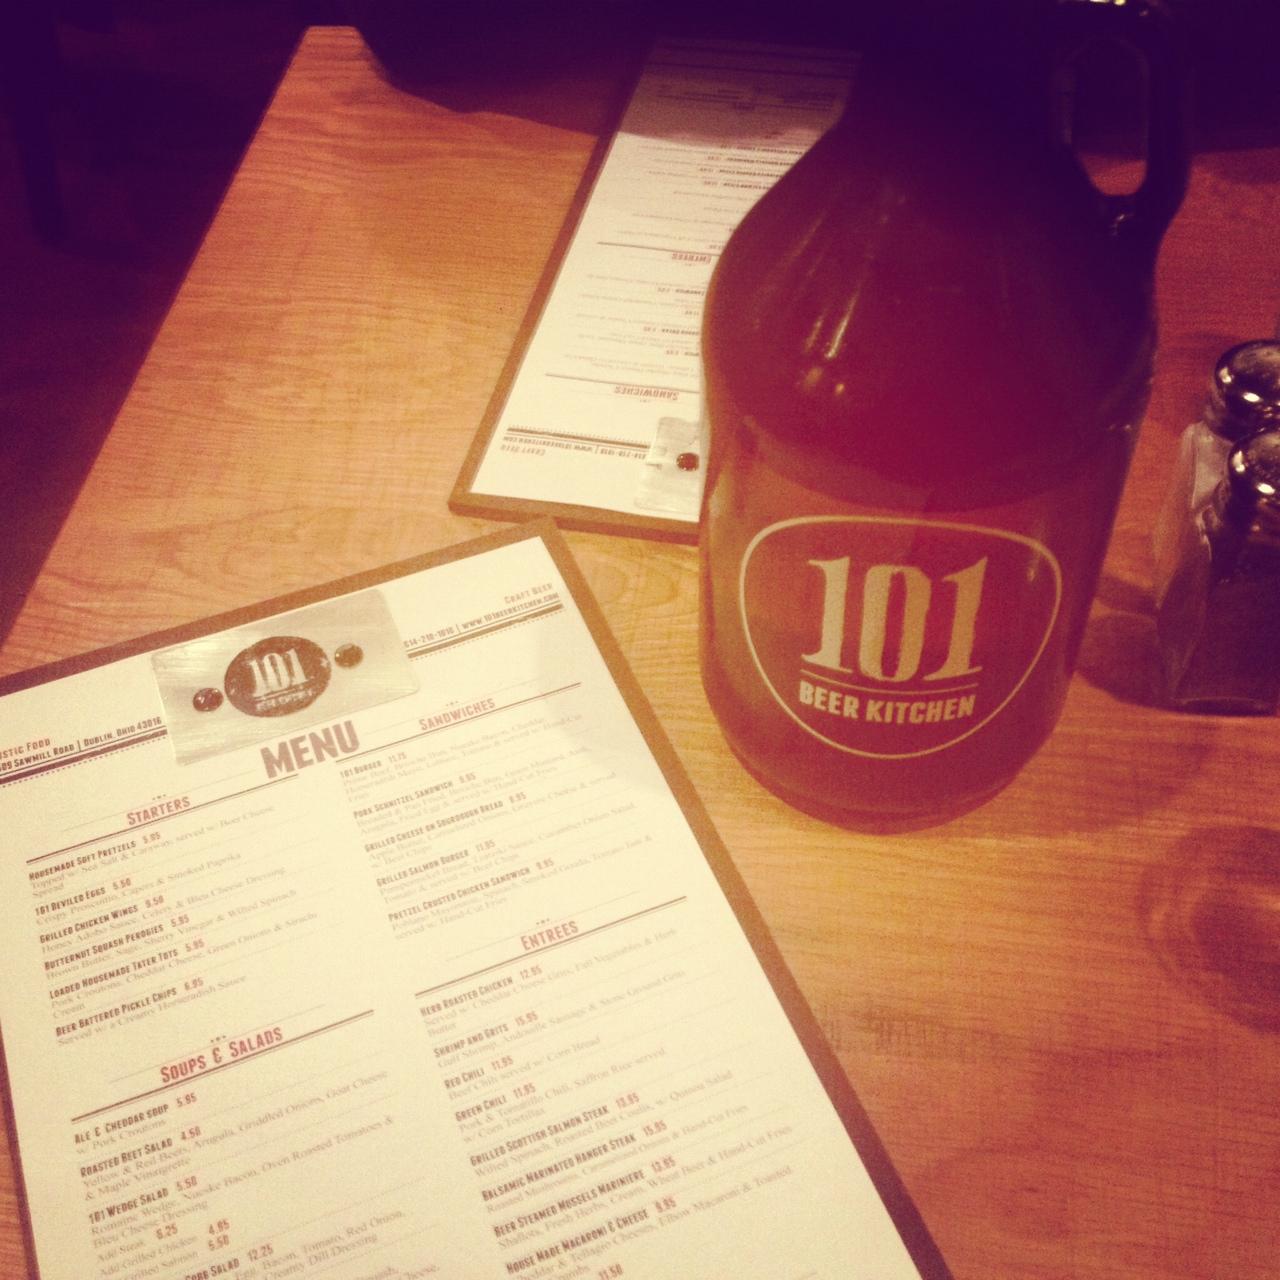 First Look: 101 Beer Kitchen | Drink Up Columbus | Columbus blog ...